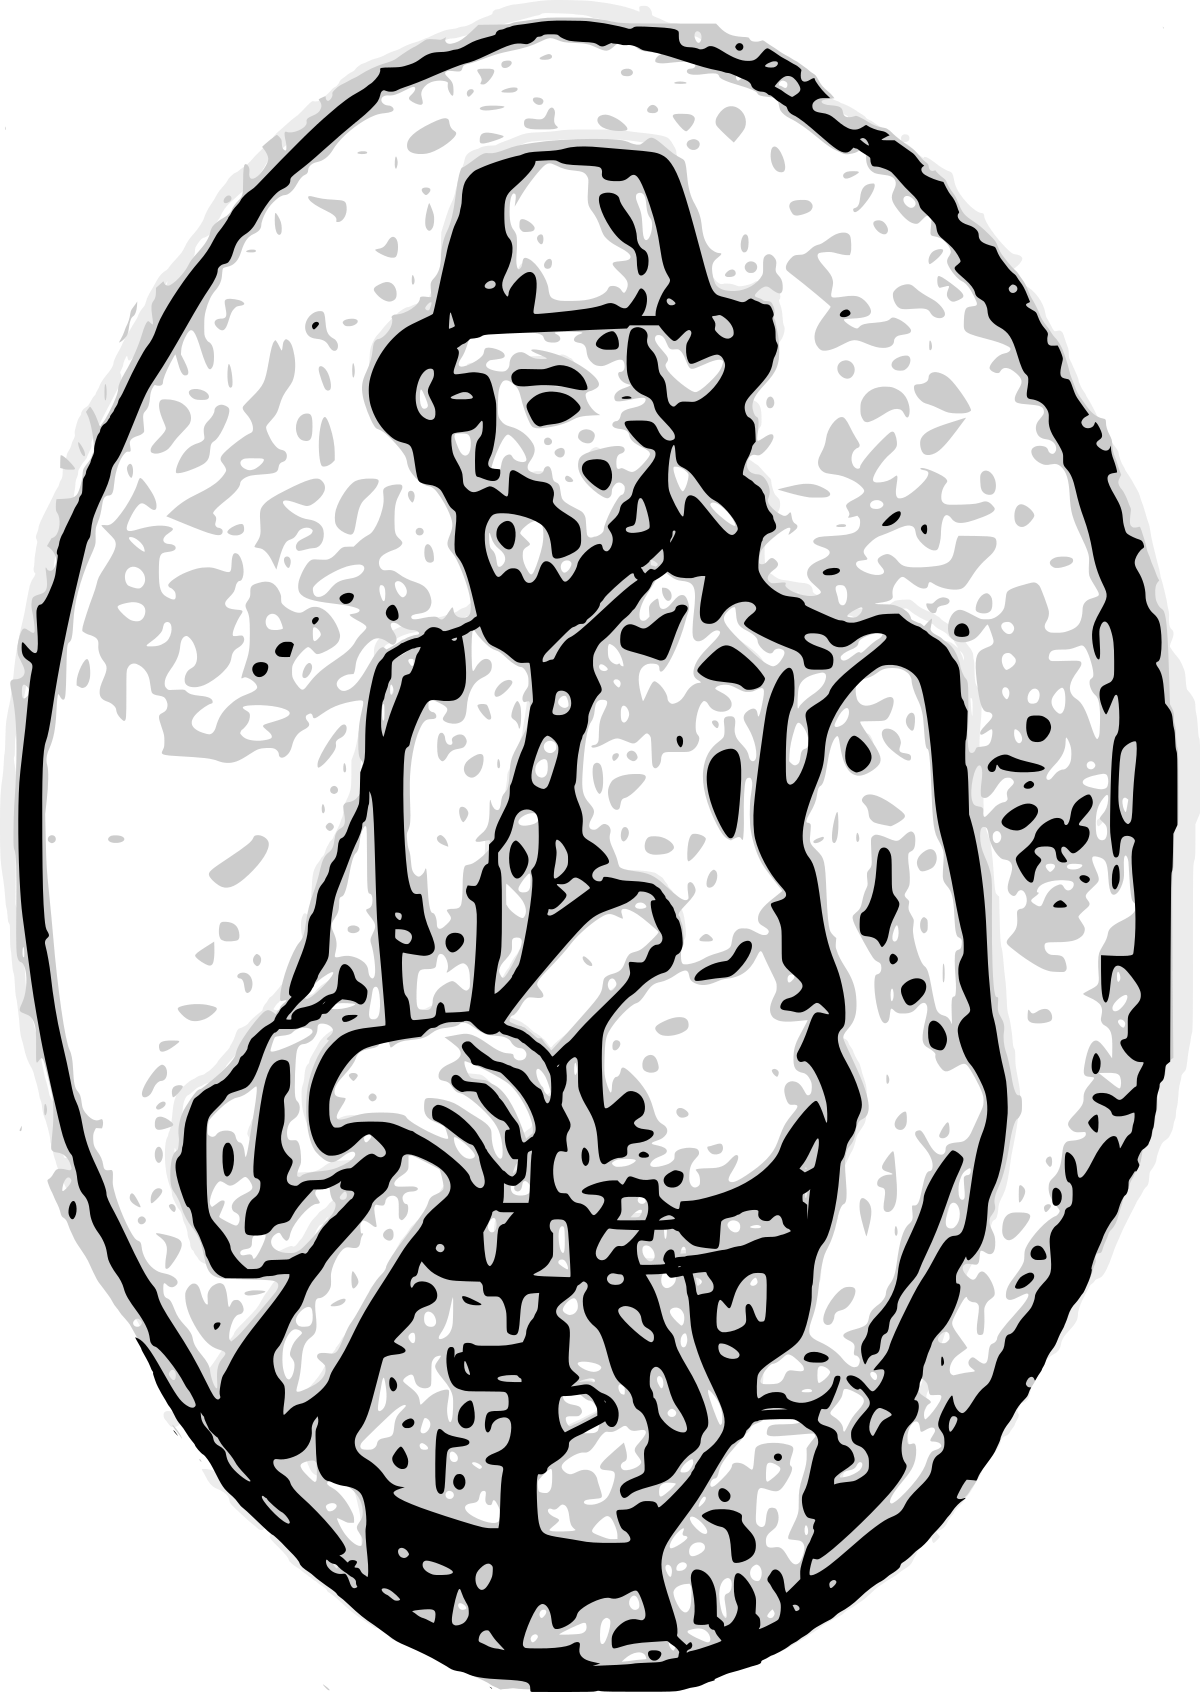 Adam s descendants clipart banner freeuse library William Adams (sailor, born 1564) - Wikipedia banner freeuse library